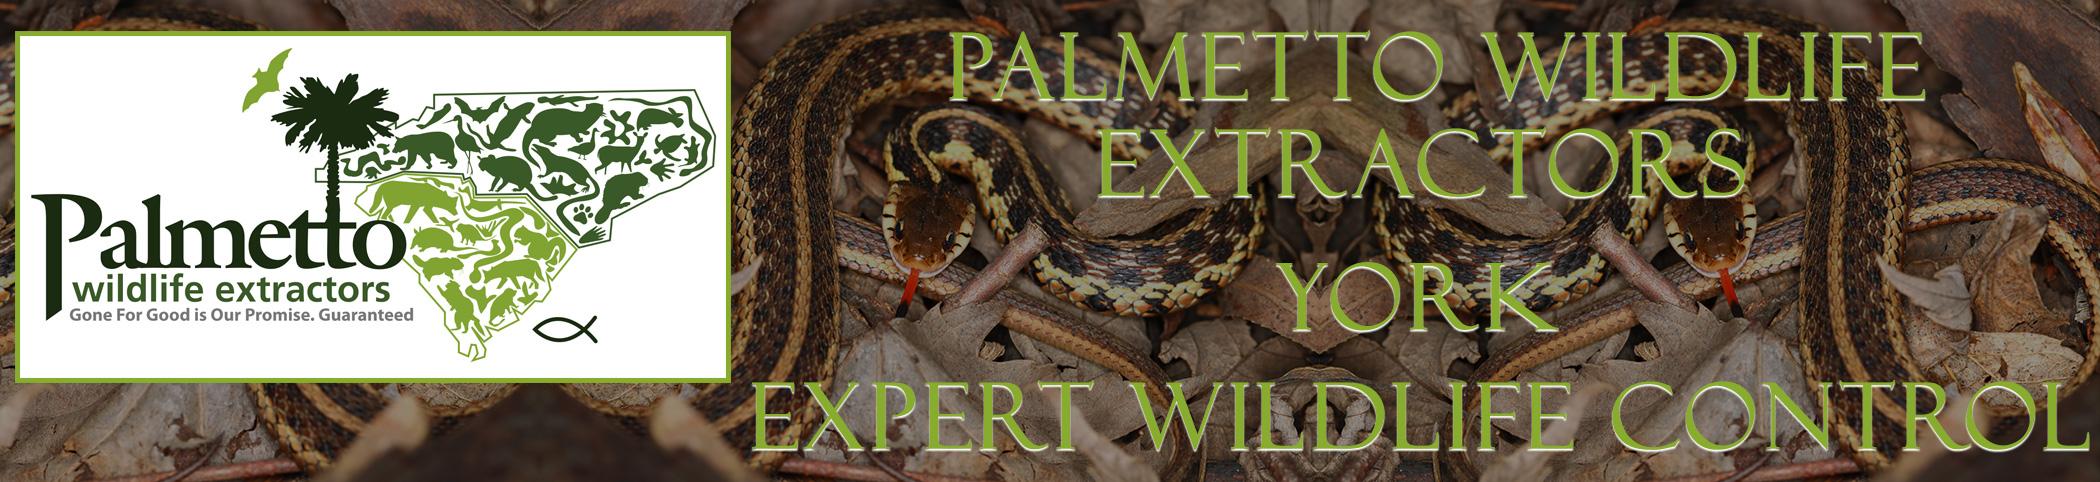 Palmetto Wildlife Extractors York South Carolina header image